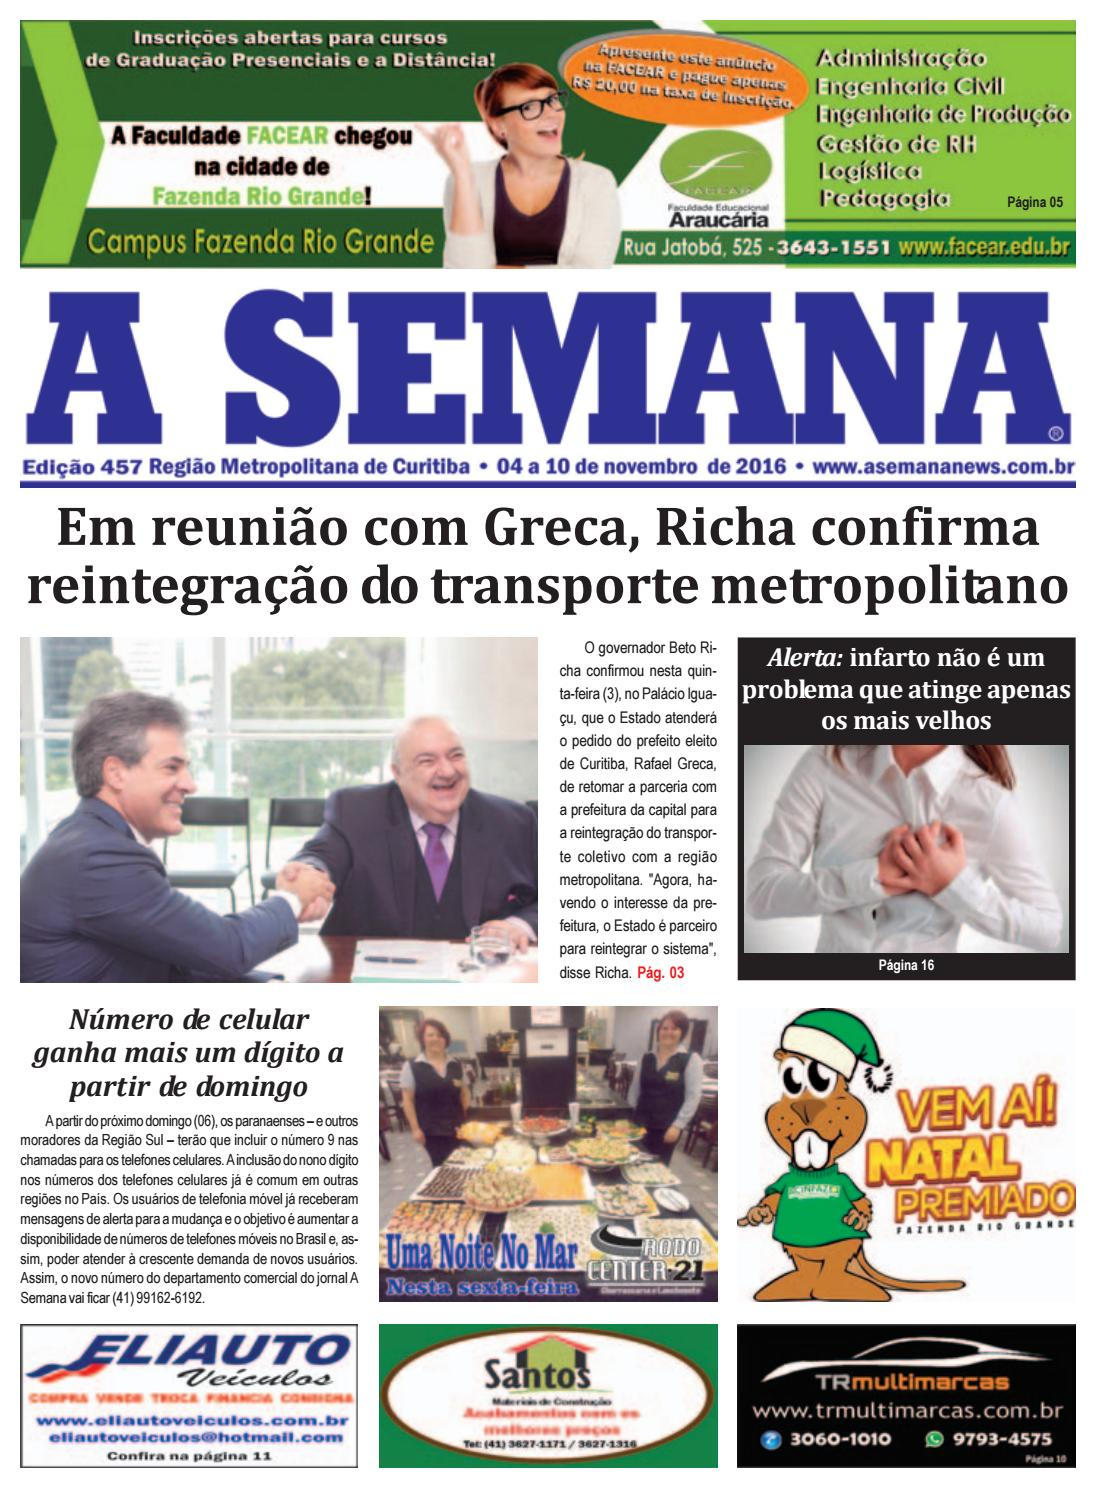 Edição 457 by asemana news - issuu b13c6fa180